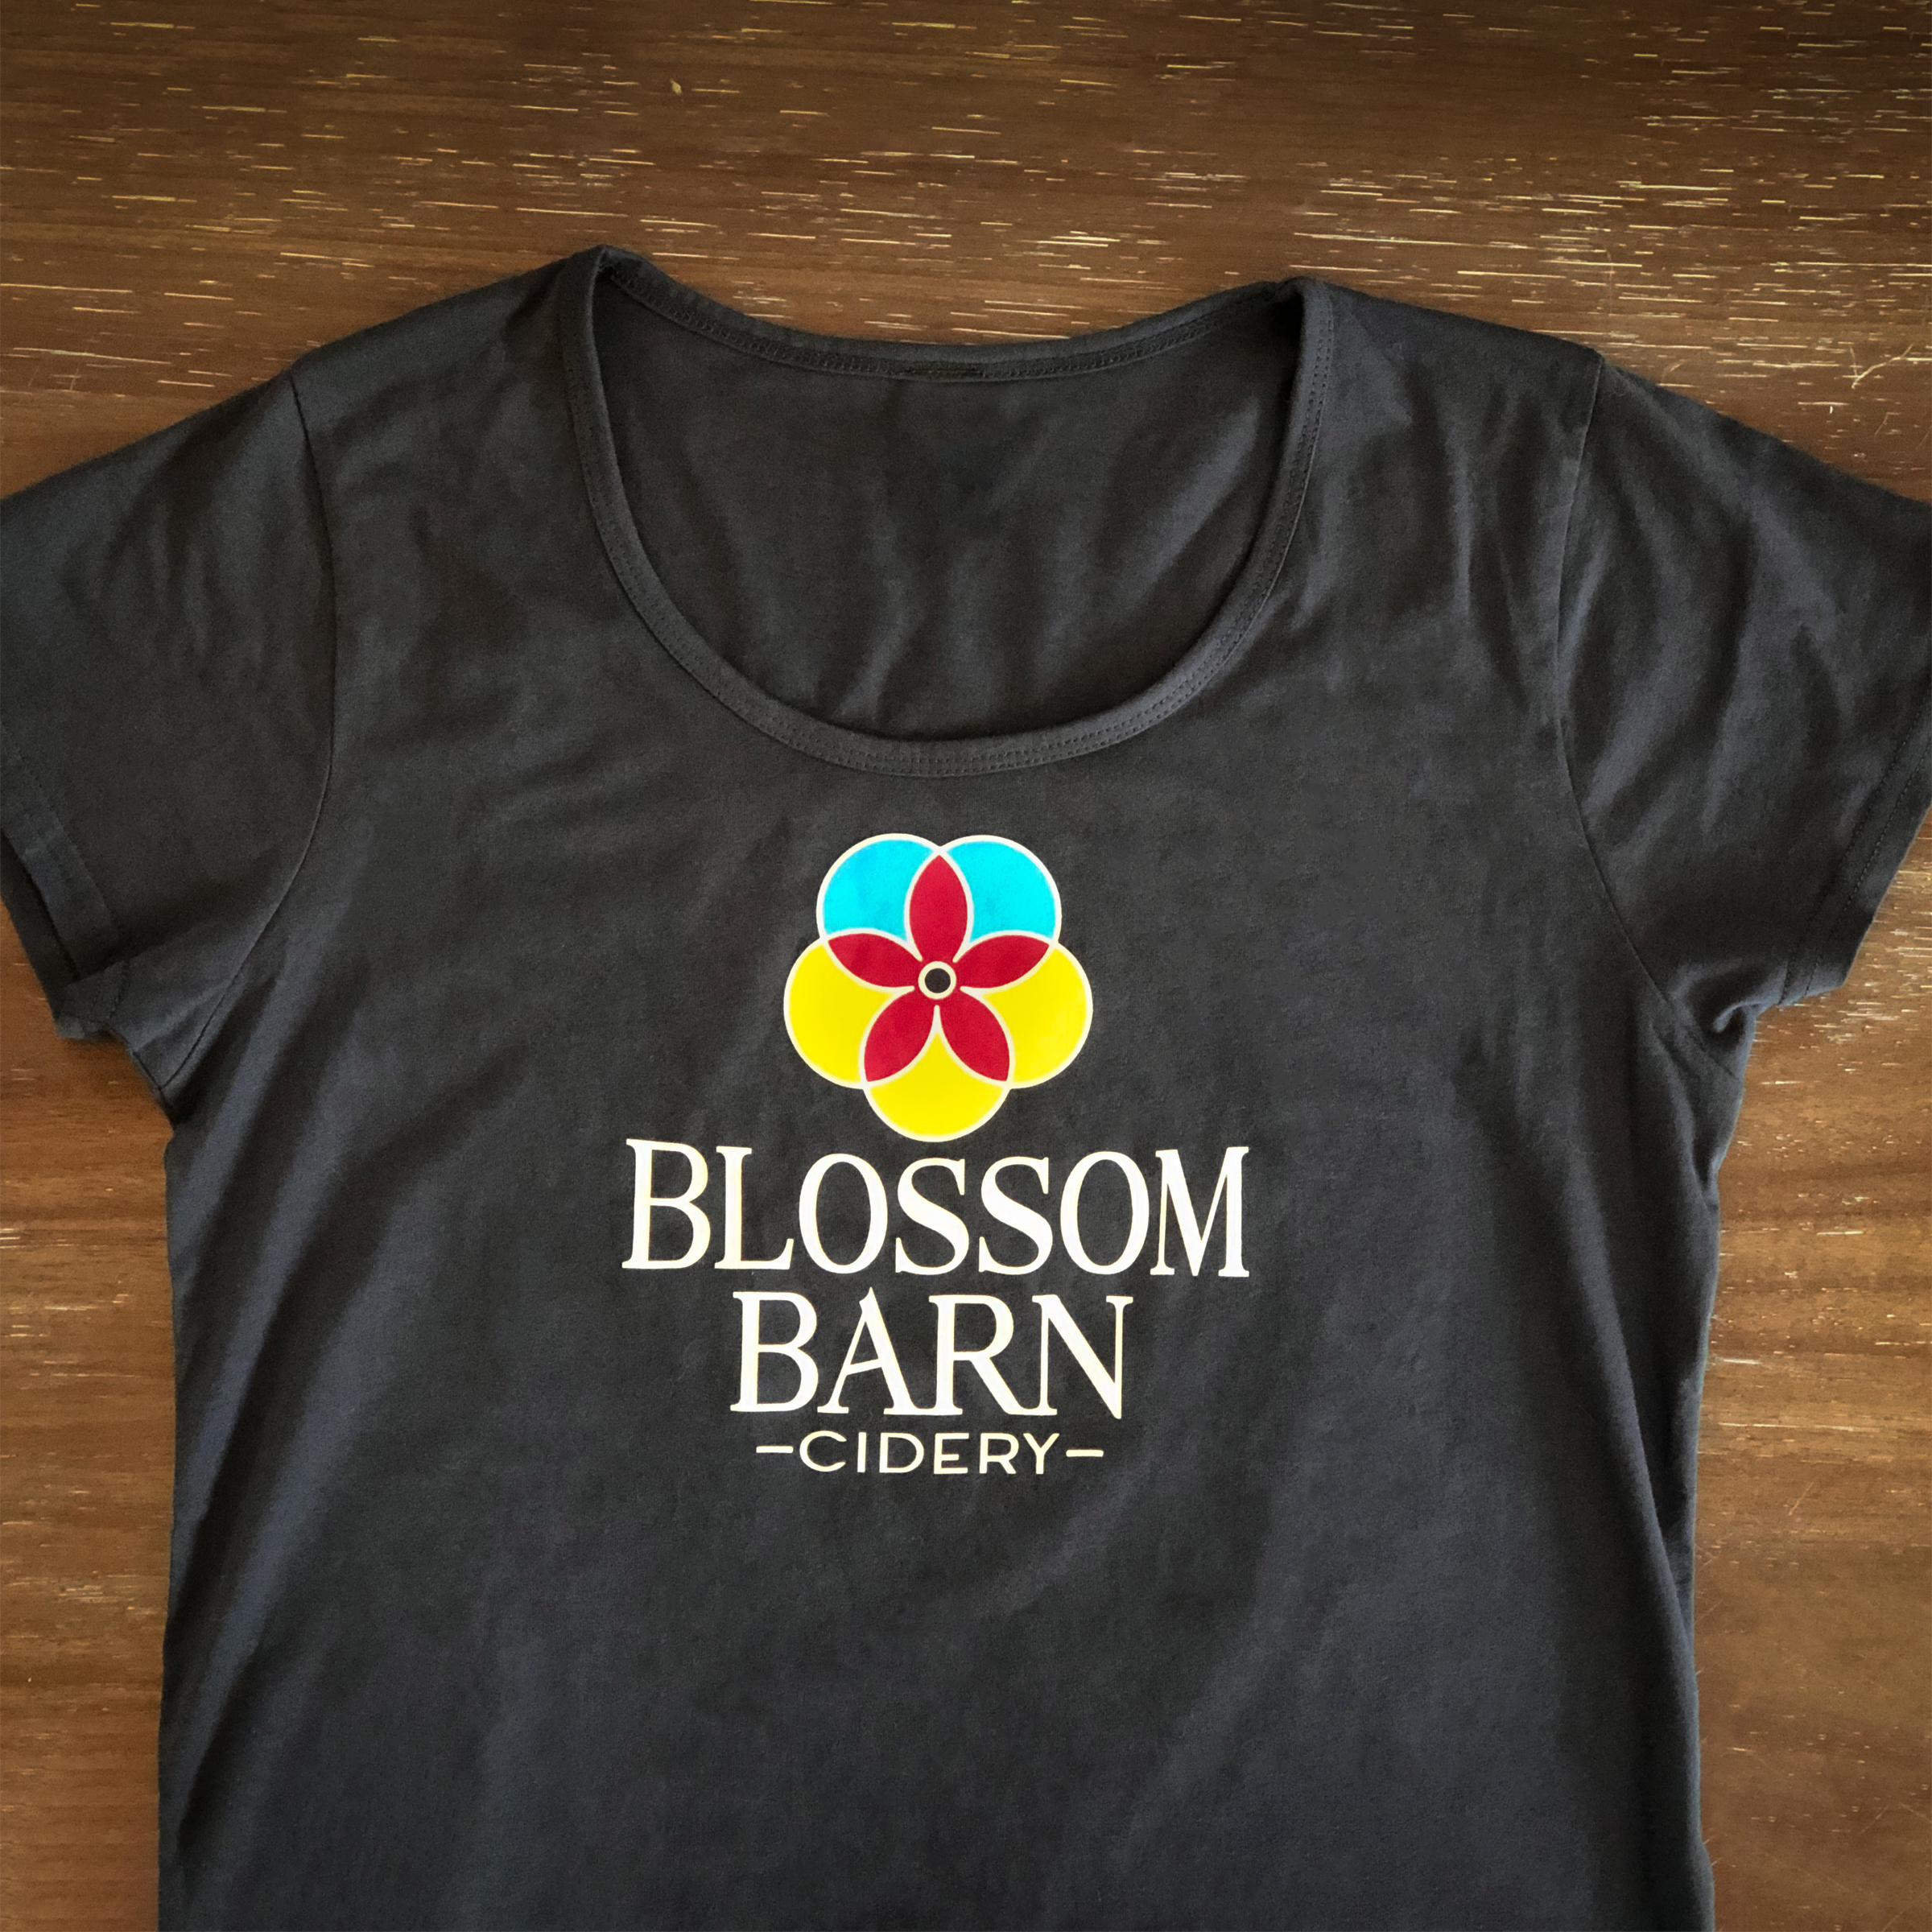 Women's Gray T-Shirt